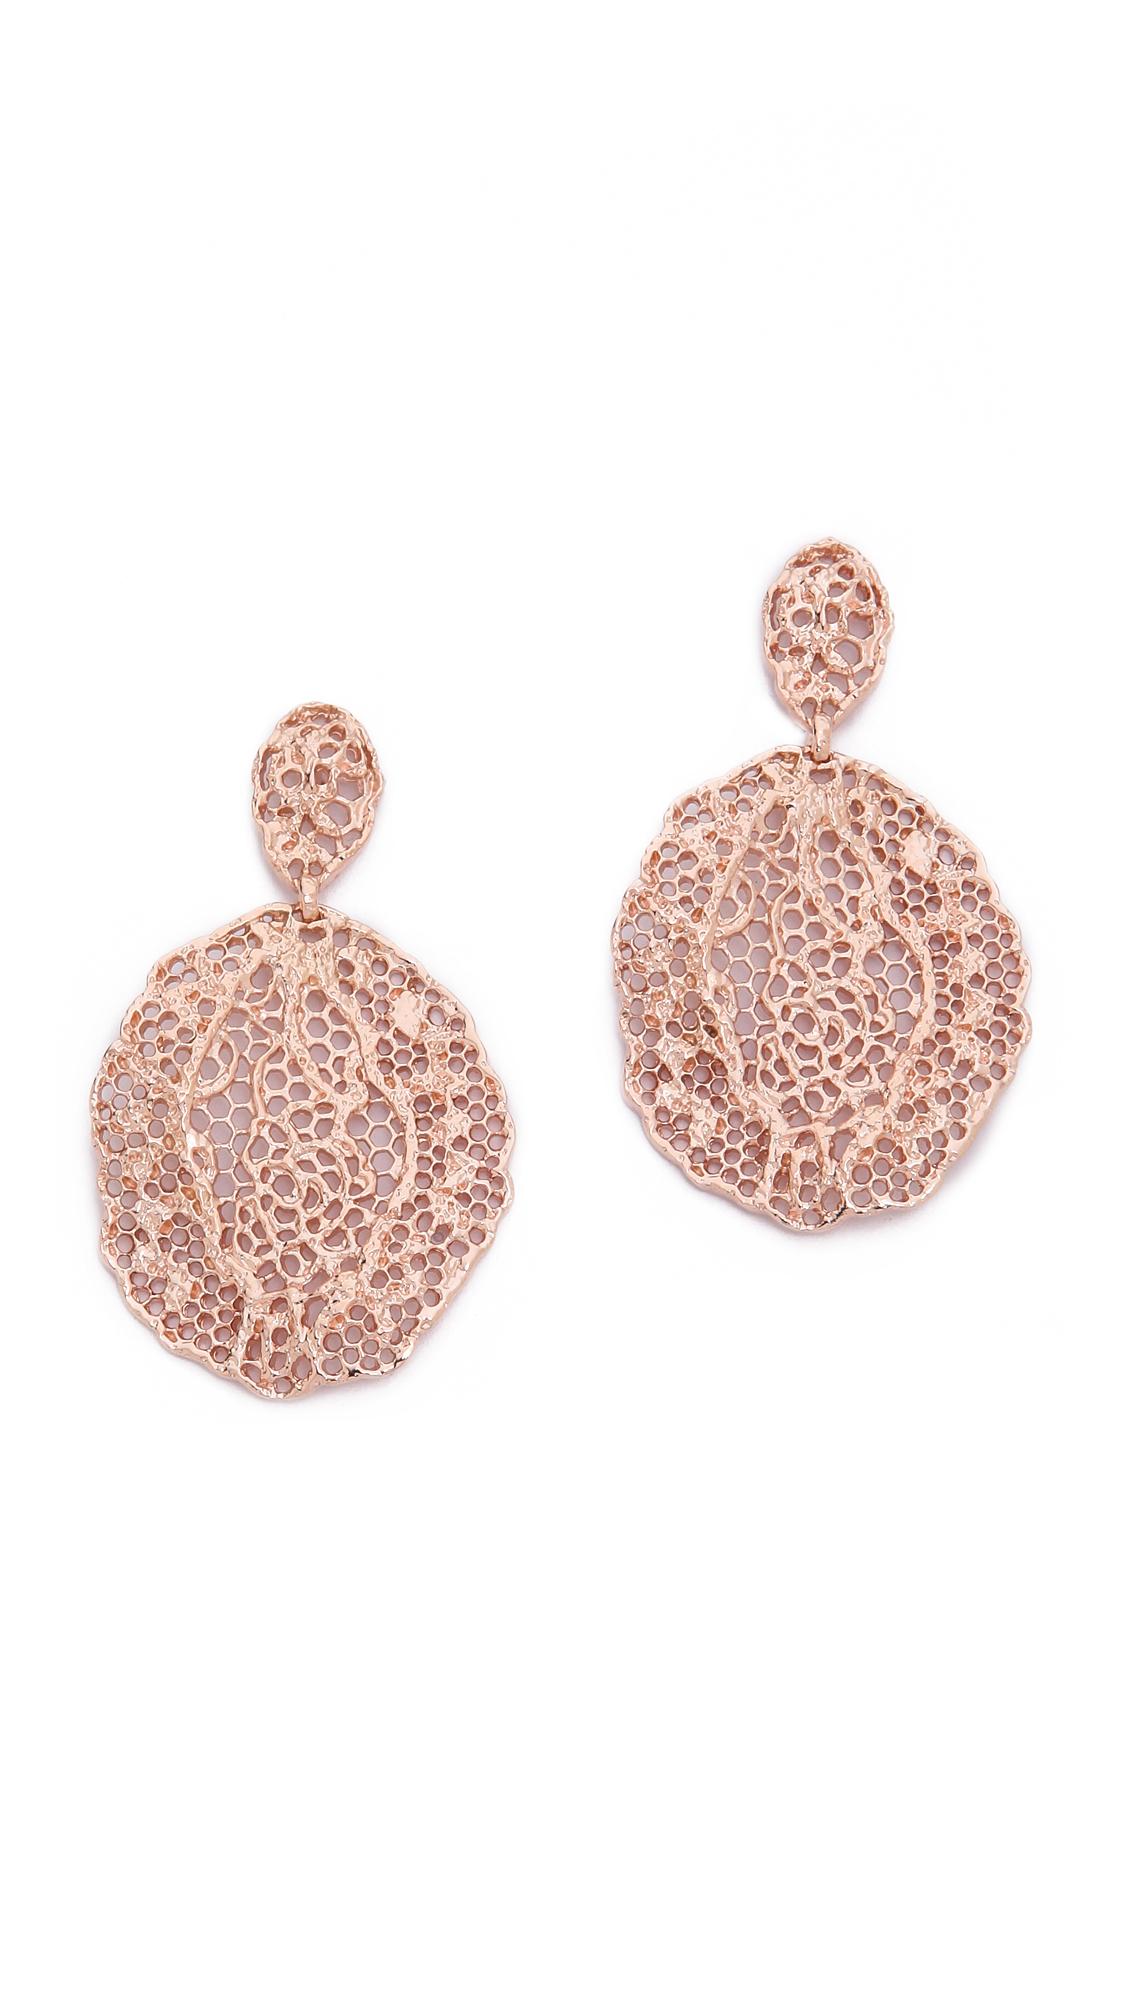 Aurelie Bidermann Lace Earrings - Rose Gold at Shopbop